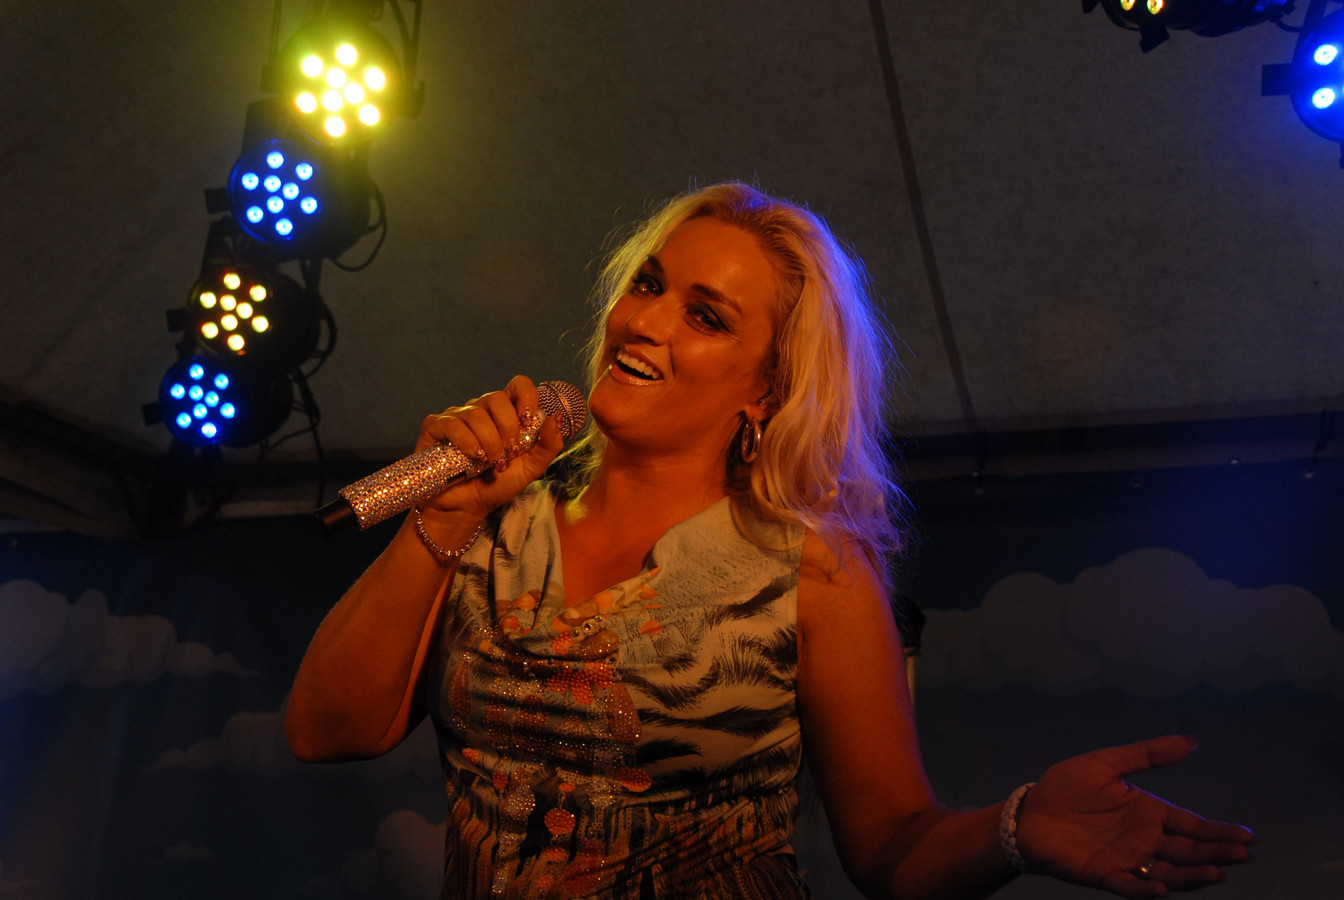 Samantha Steenwijk